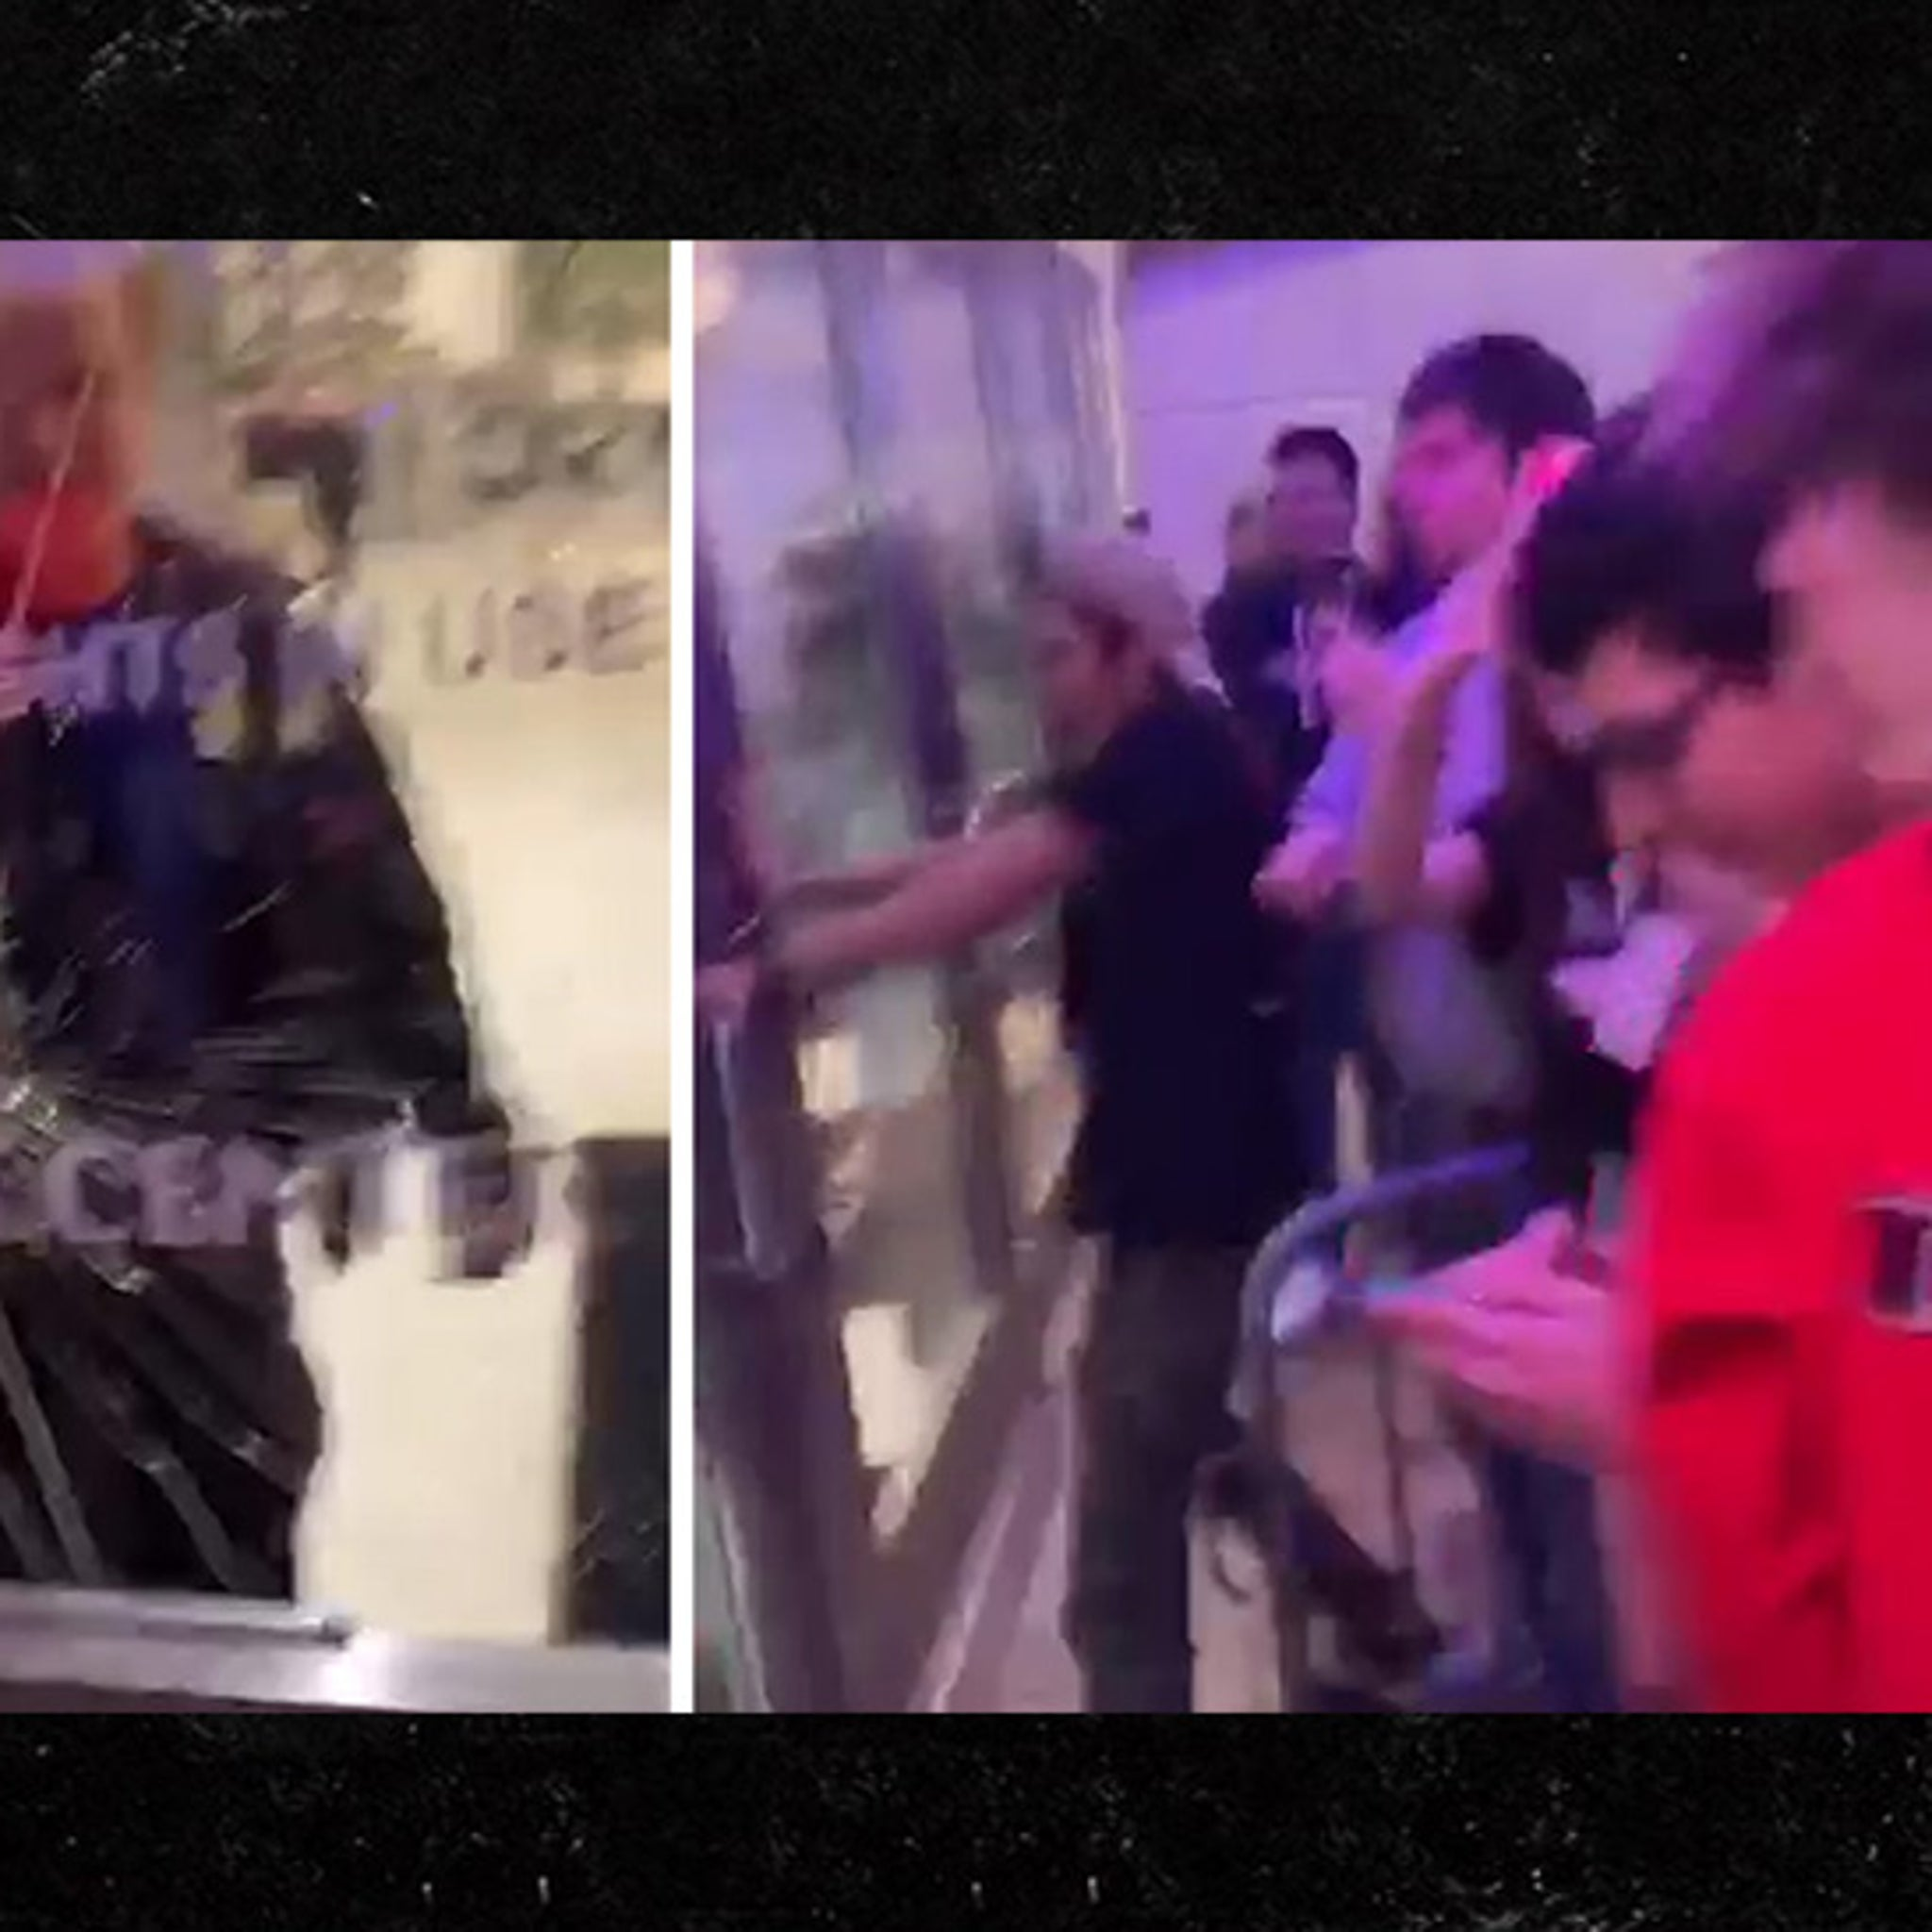 febd97a84dbe Travis Scott Fans Freak Out Over Postponed Show, Shatter Glass Door